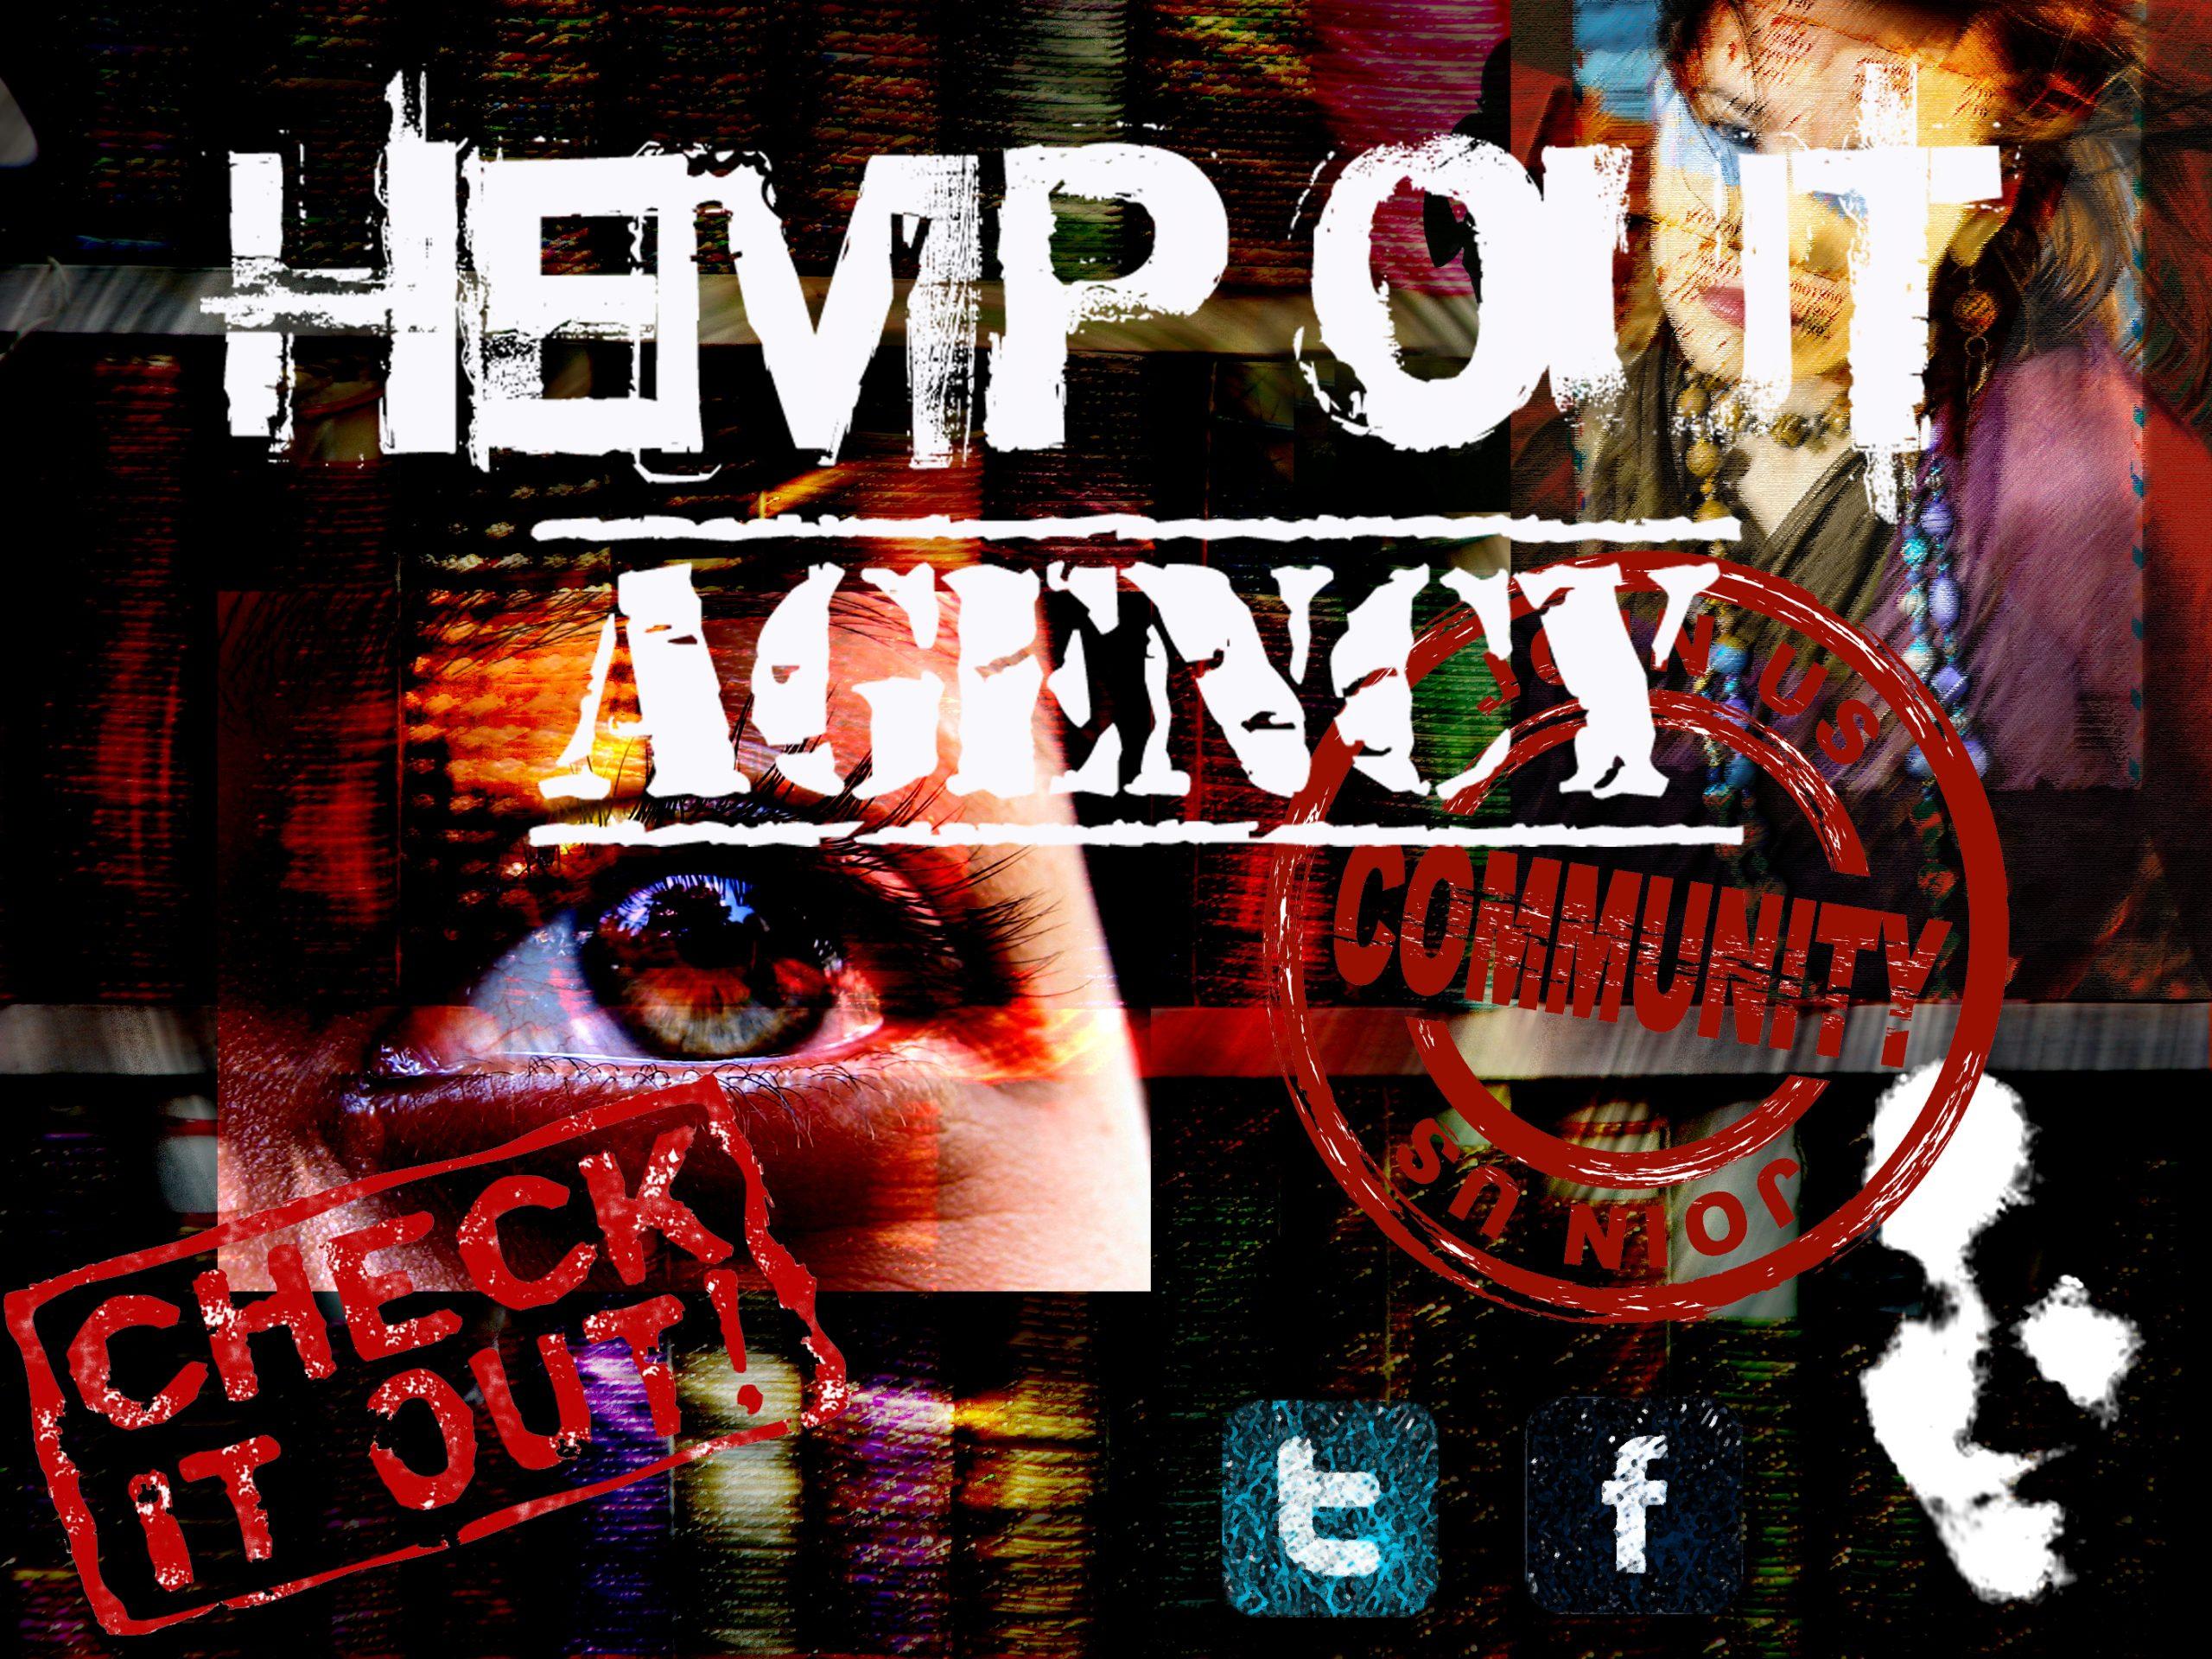 "DETOXIFICATION ""Hemp oil"" is a great detoxifier…love handles too we gotcha covered!"